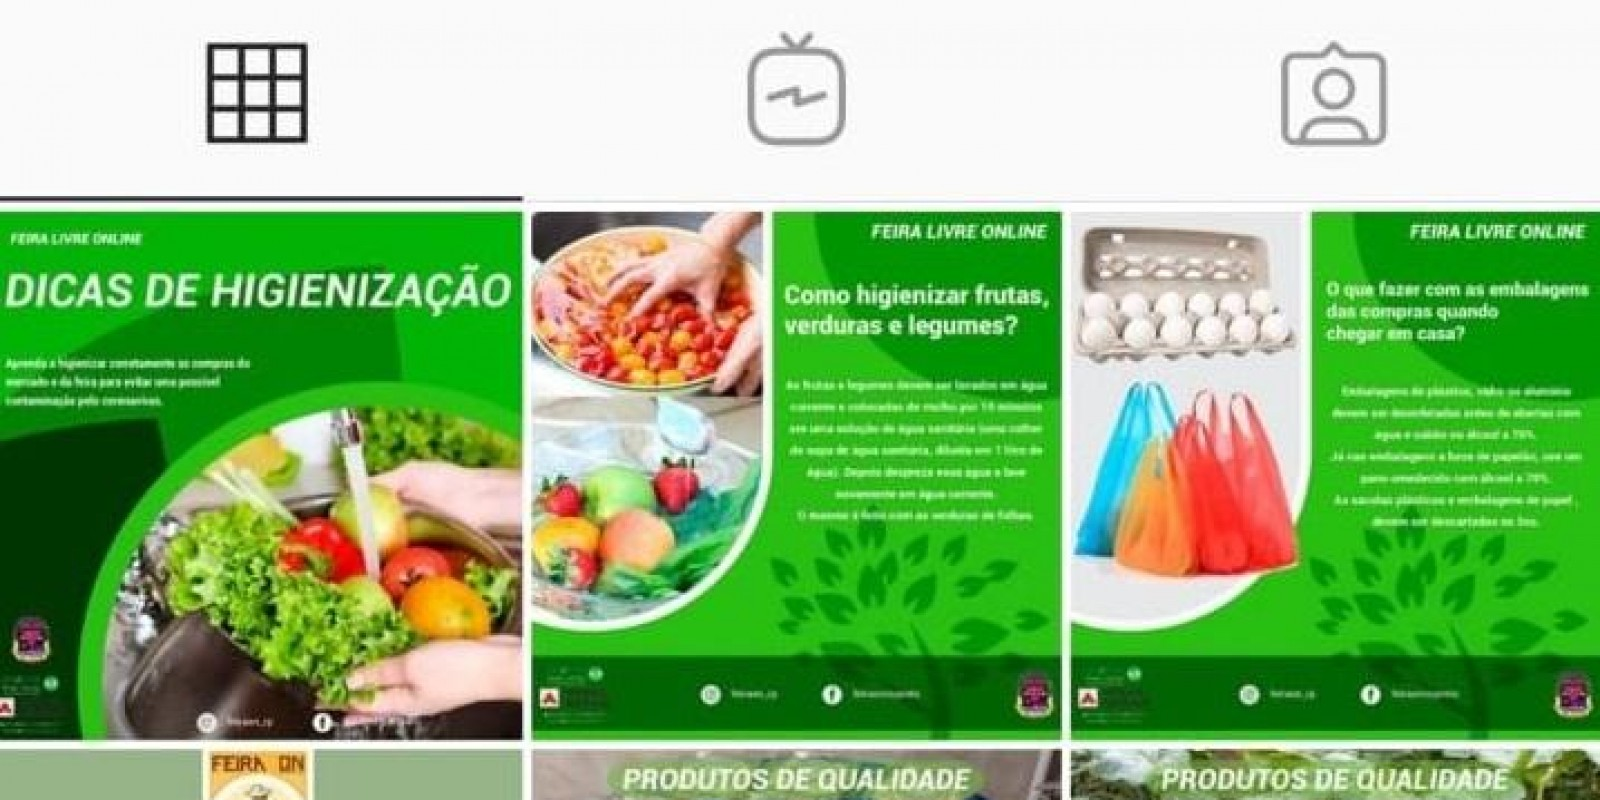 Emater-MG faz levantamento de iniciativas de vendas on-line por agricultores familiares durante a pandemia